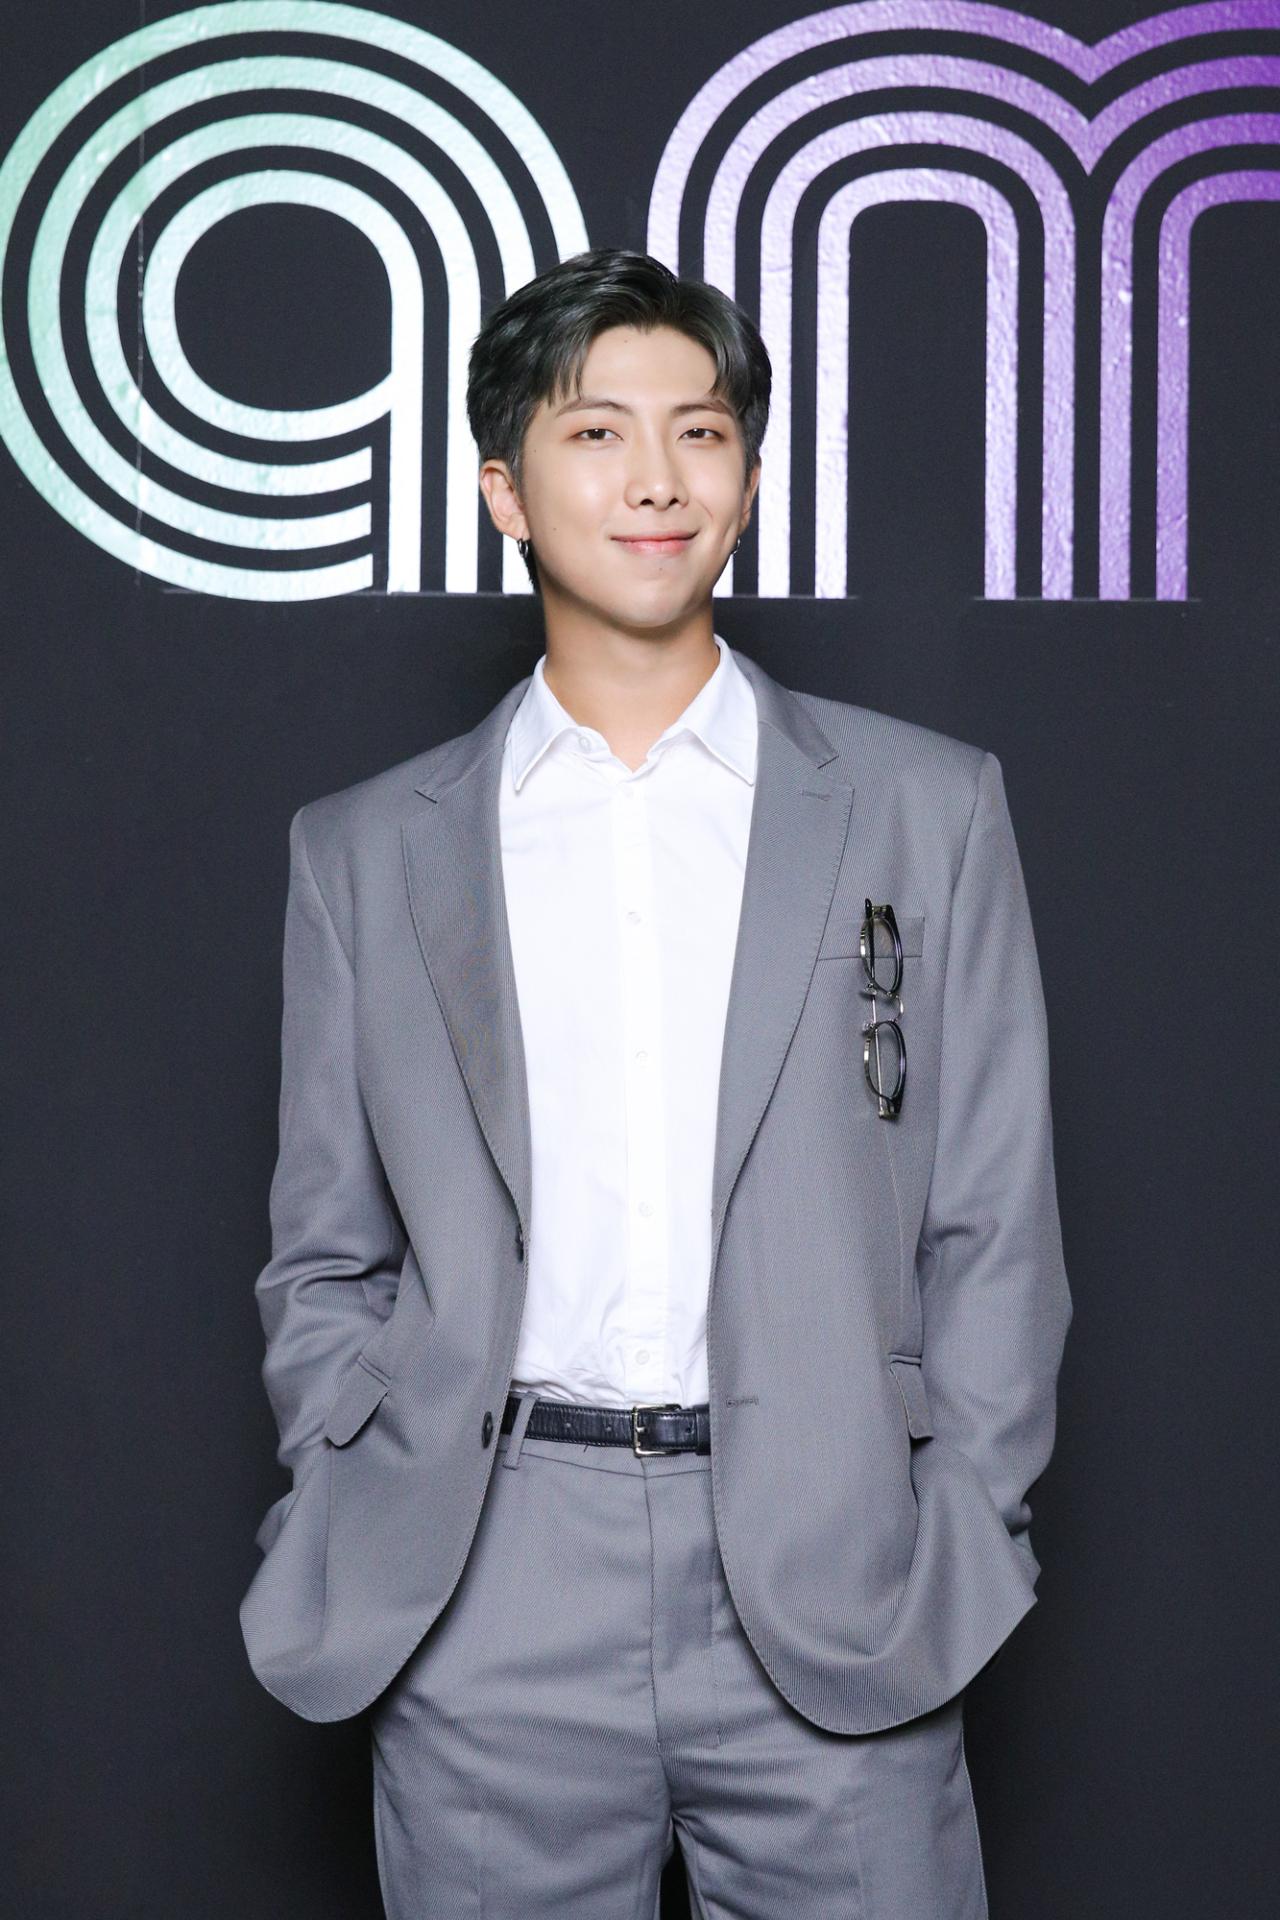 RM (Big Hit Entertainment)